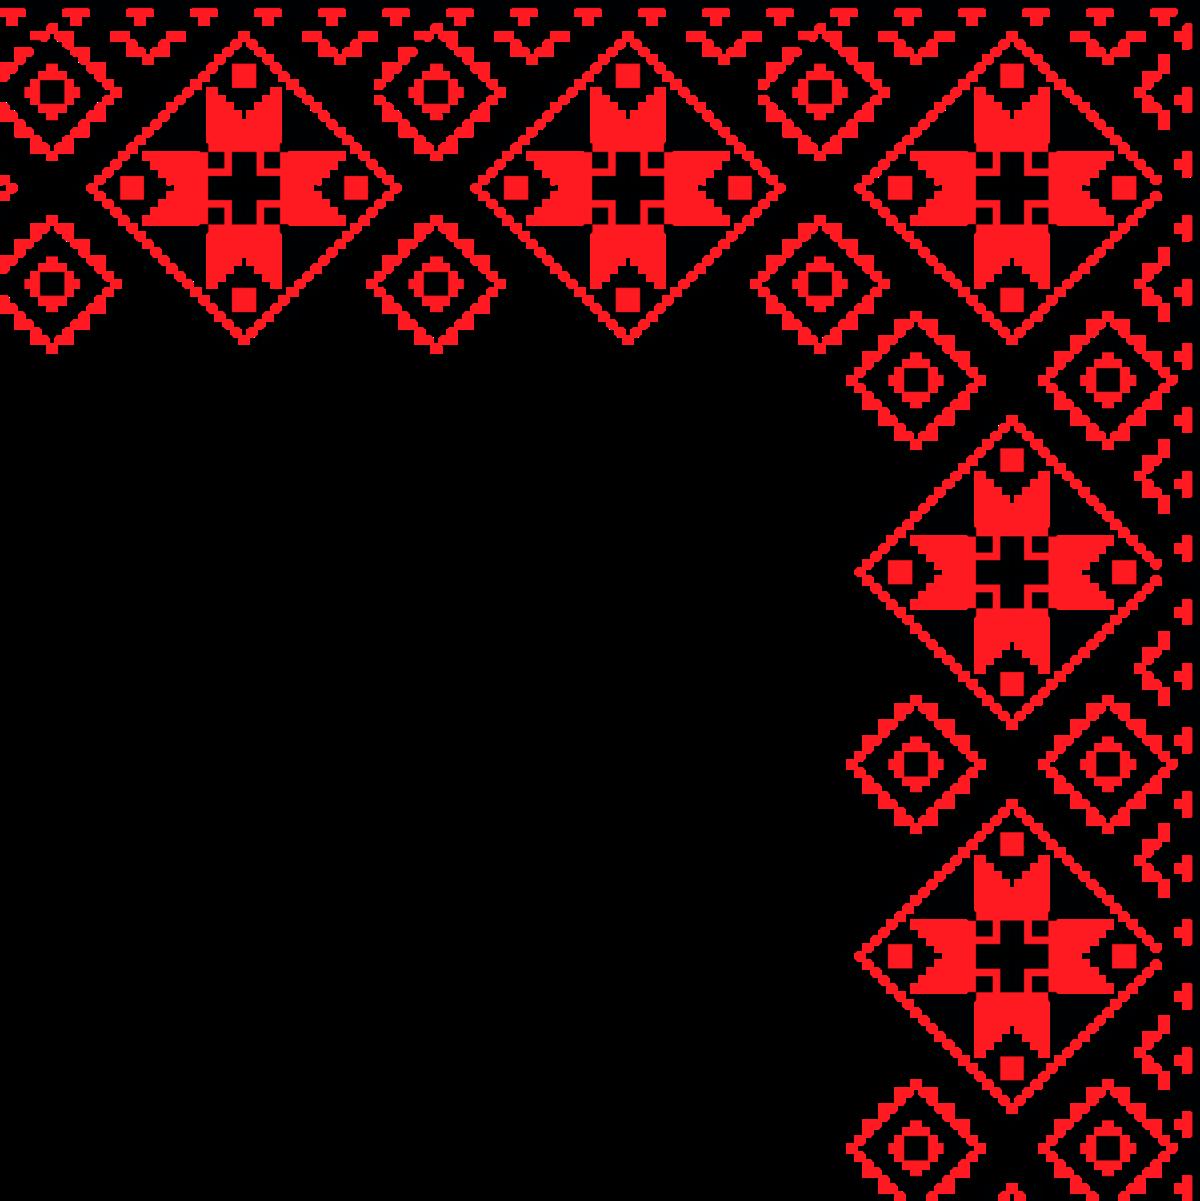 Чувашский орнамент картинки для рамки, ватсап днем